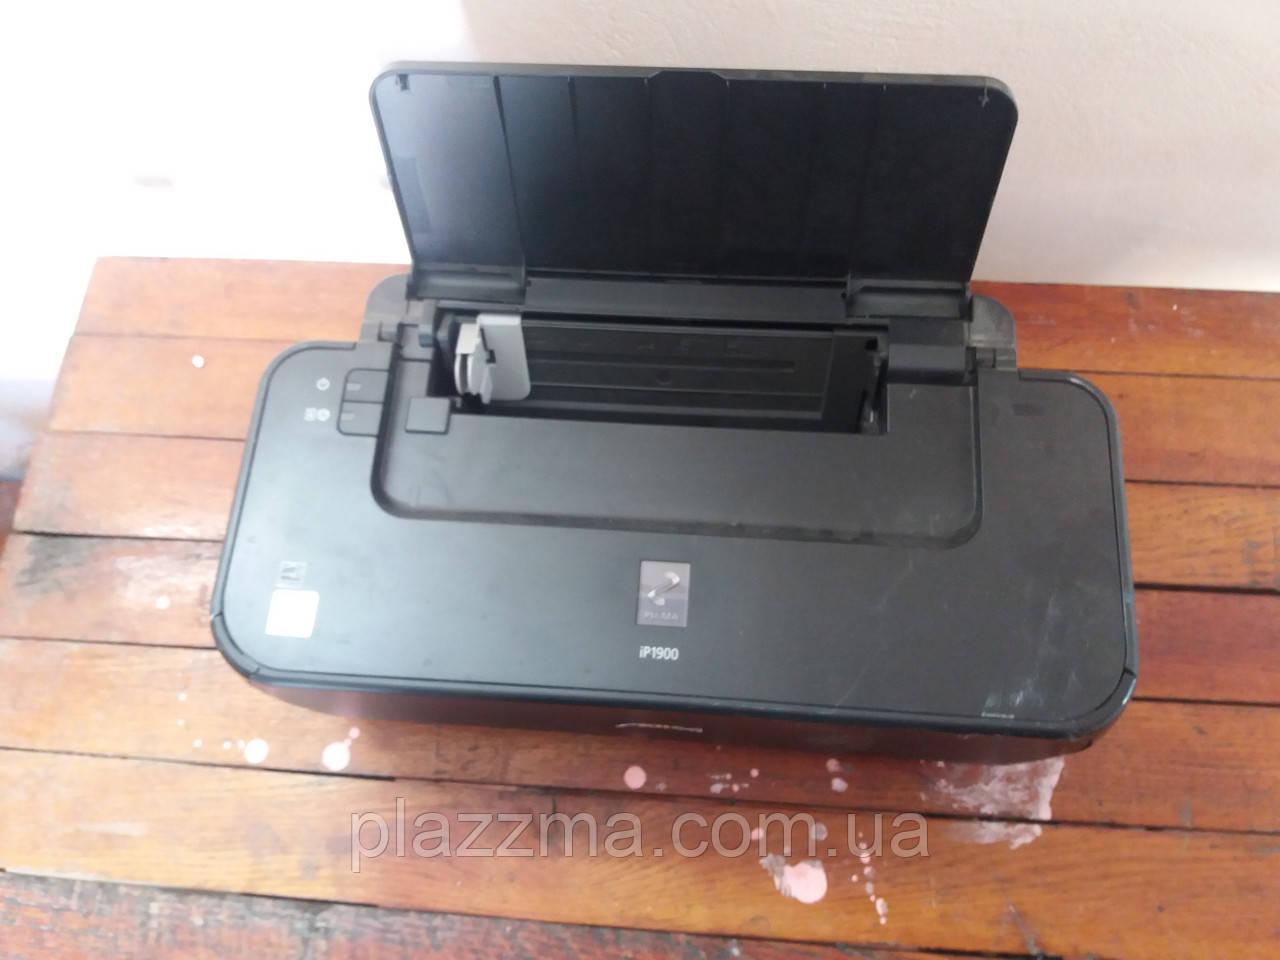 Canon ip1900 ремонт ремонт электронных книг алтуфьево